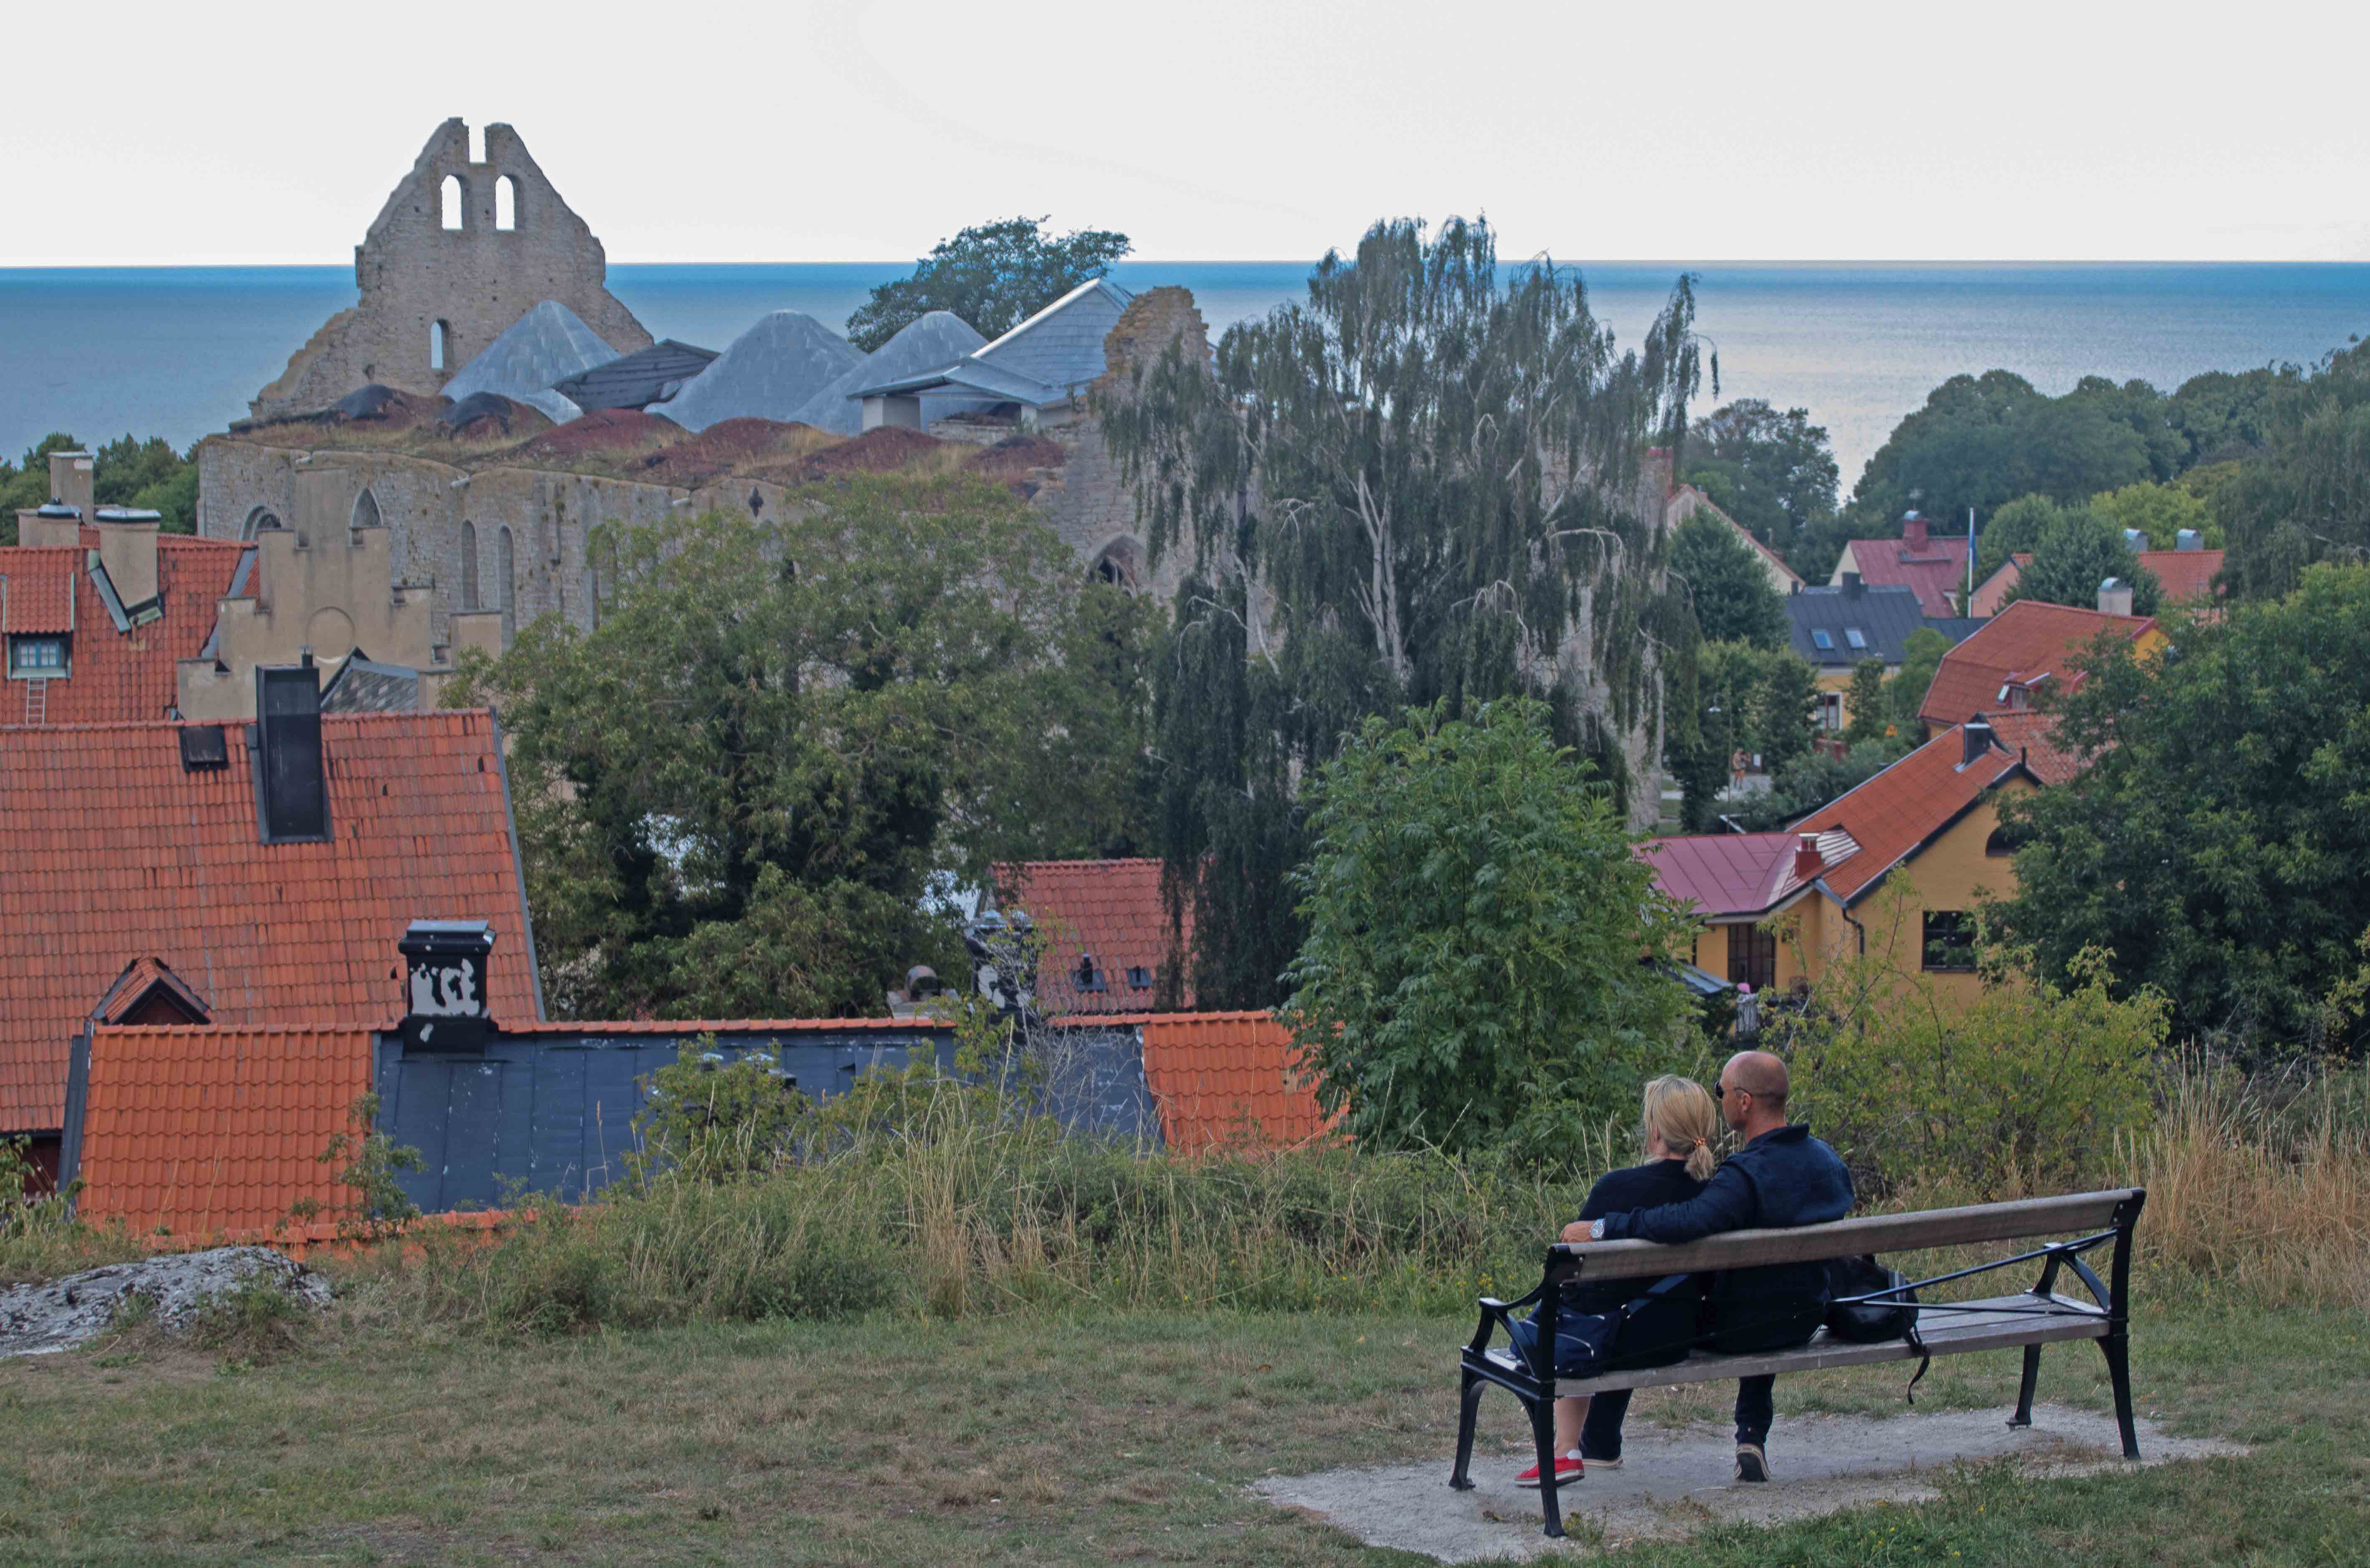 Nimi: Visby, Kuvaaja: Kari Heino